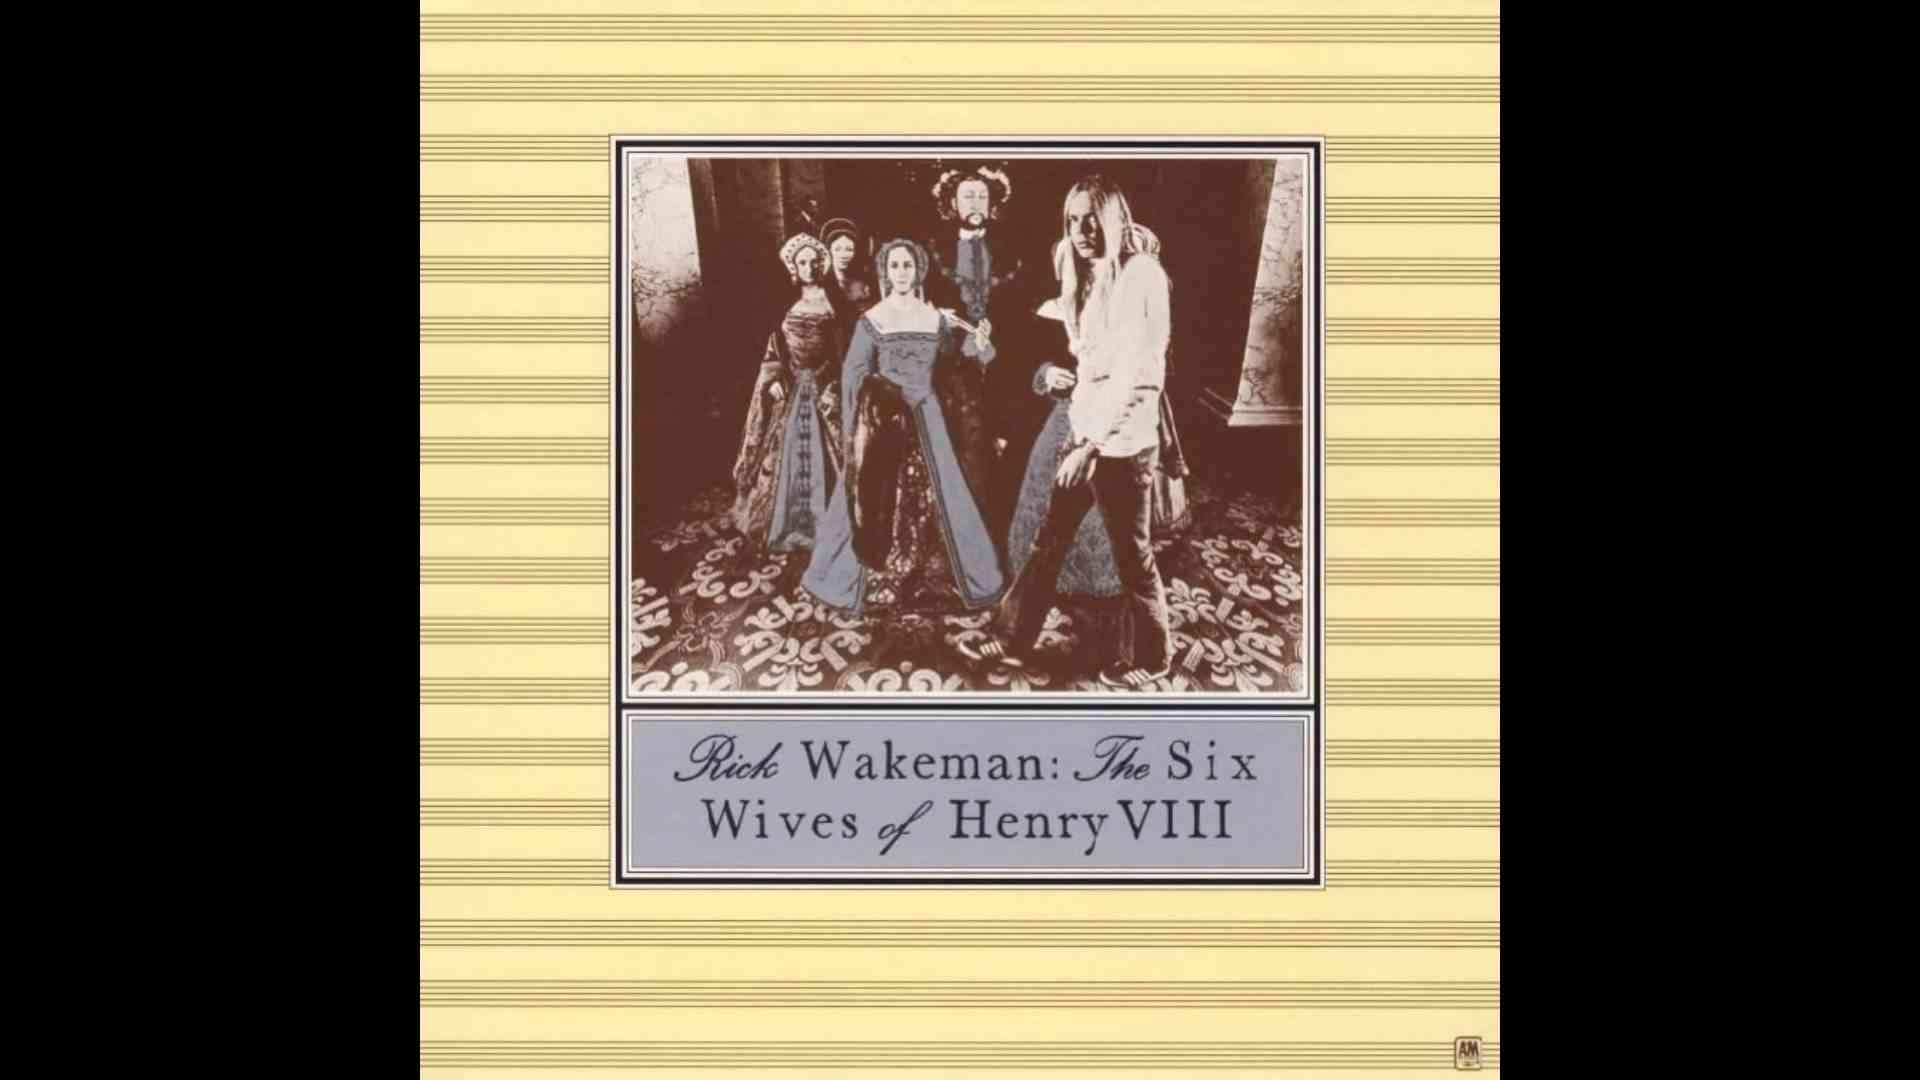 Rick Wakeman - The Six Wives of Henry VIII (Full Album 1973) - YouTube